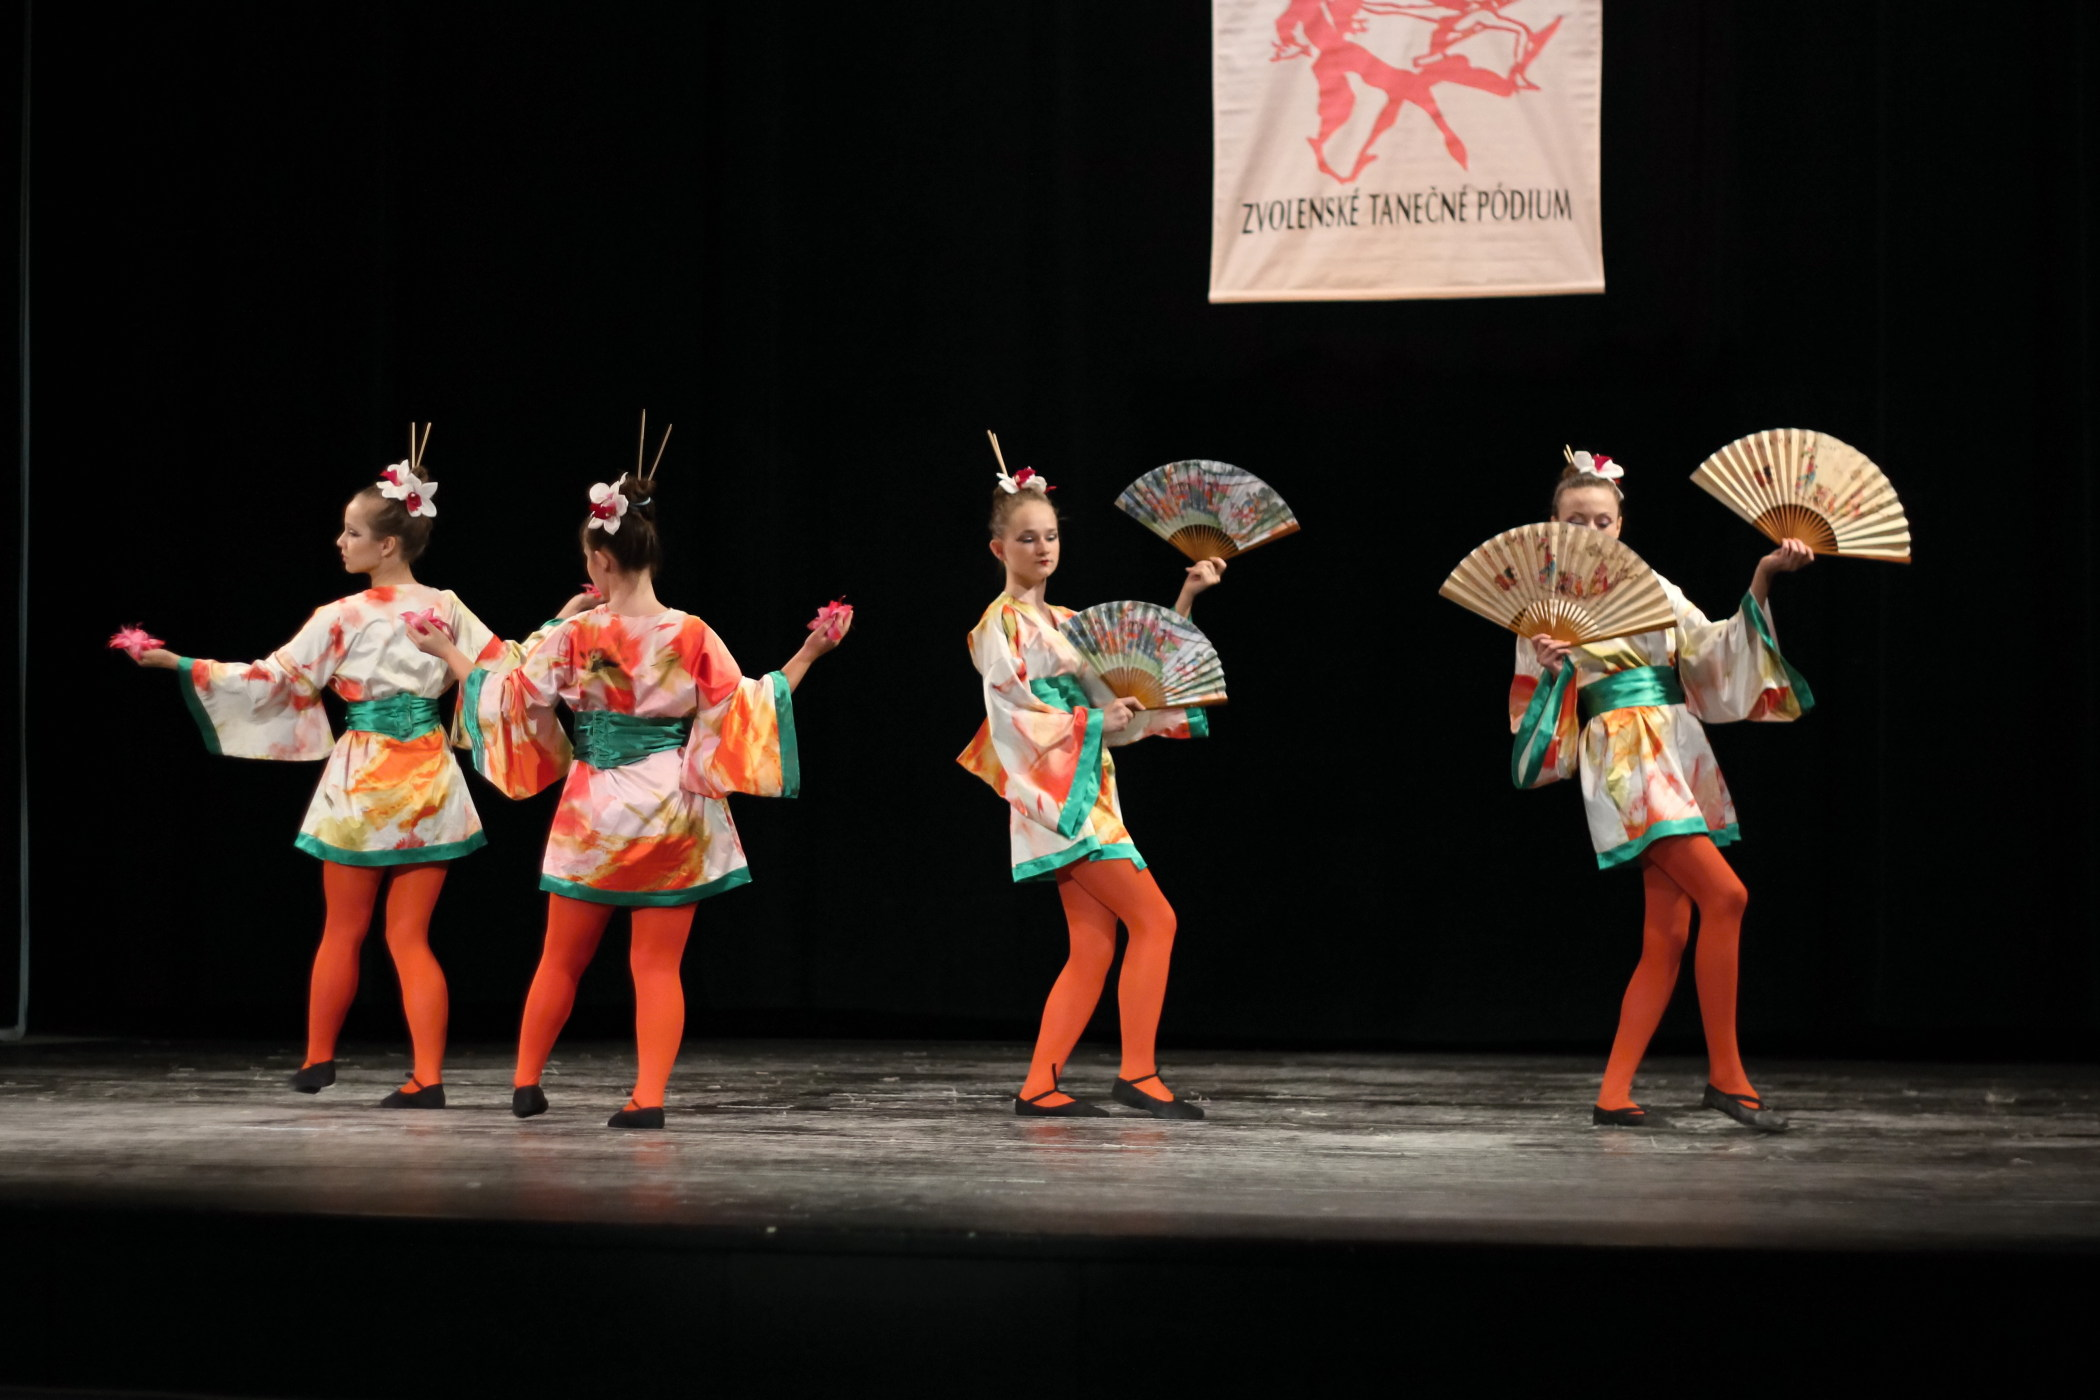 zvolenske-tanecne-podium-23